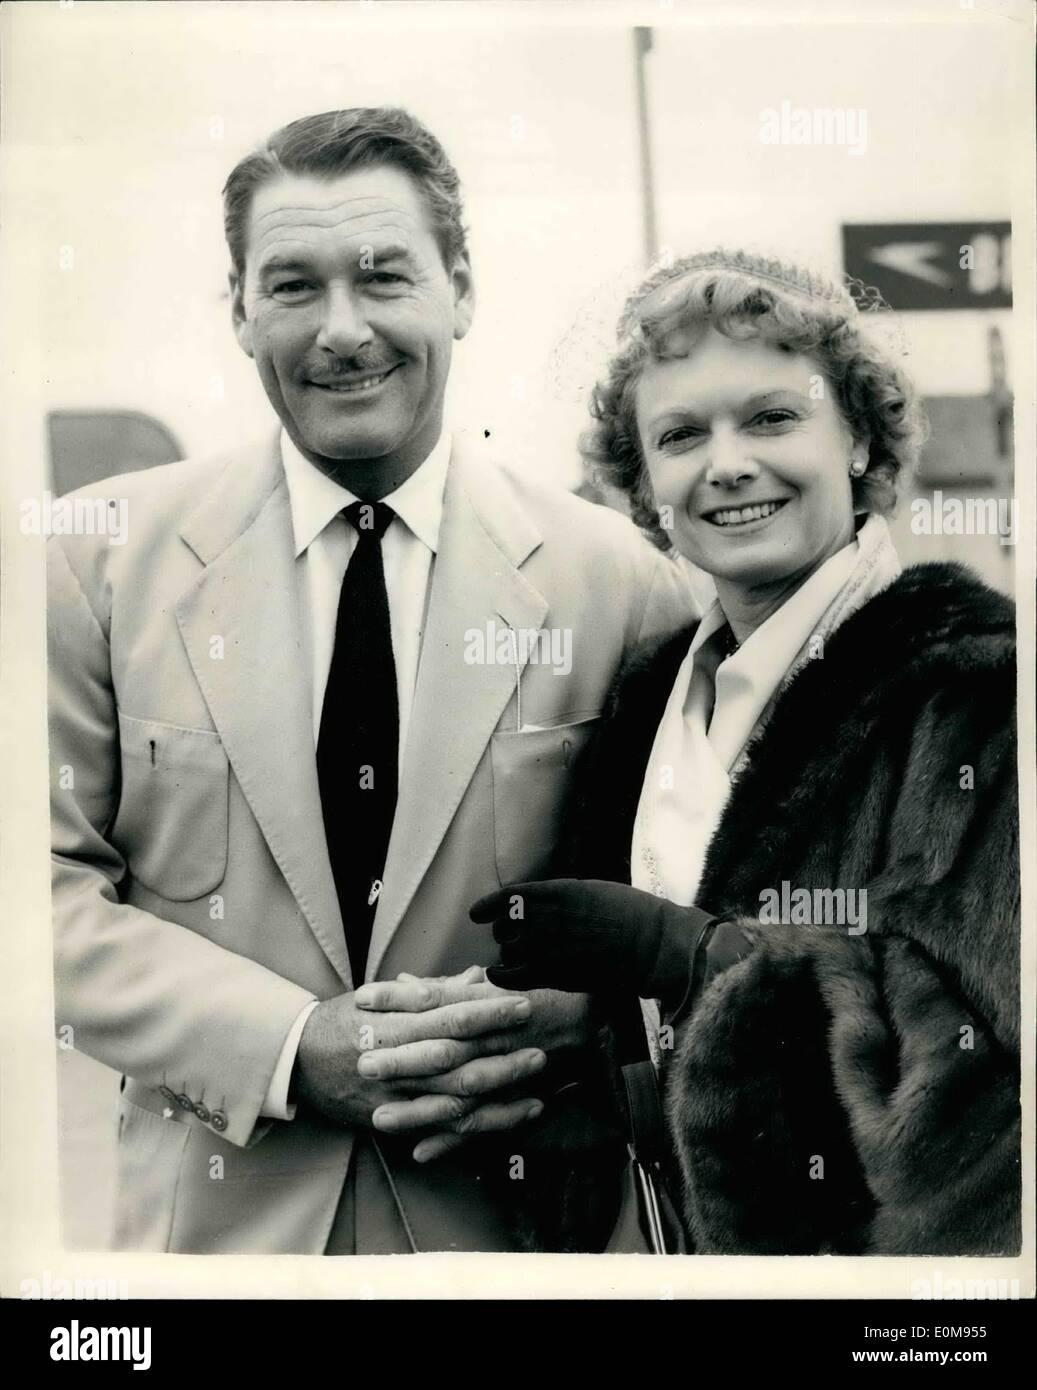 Apr. 04, 1954 - Errol Flynn arrives. Hollywood film star Errol Flynn, who is to star with Anna Neagle in her next - Stock Image